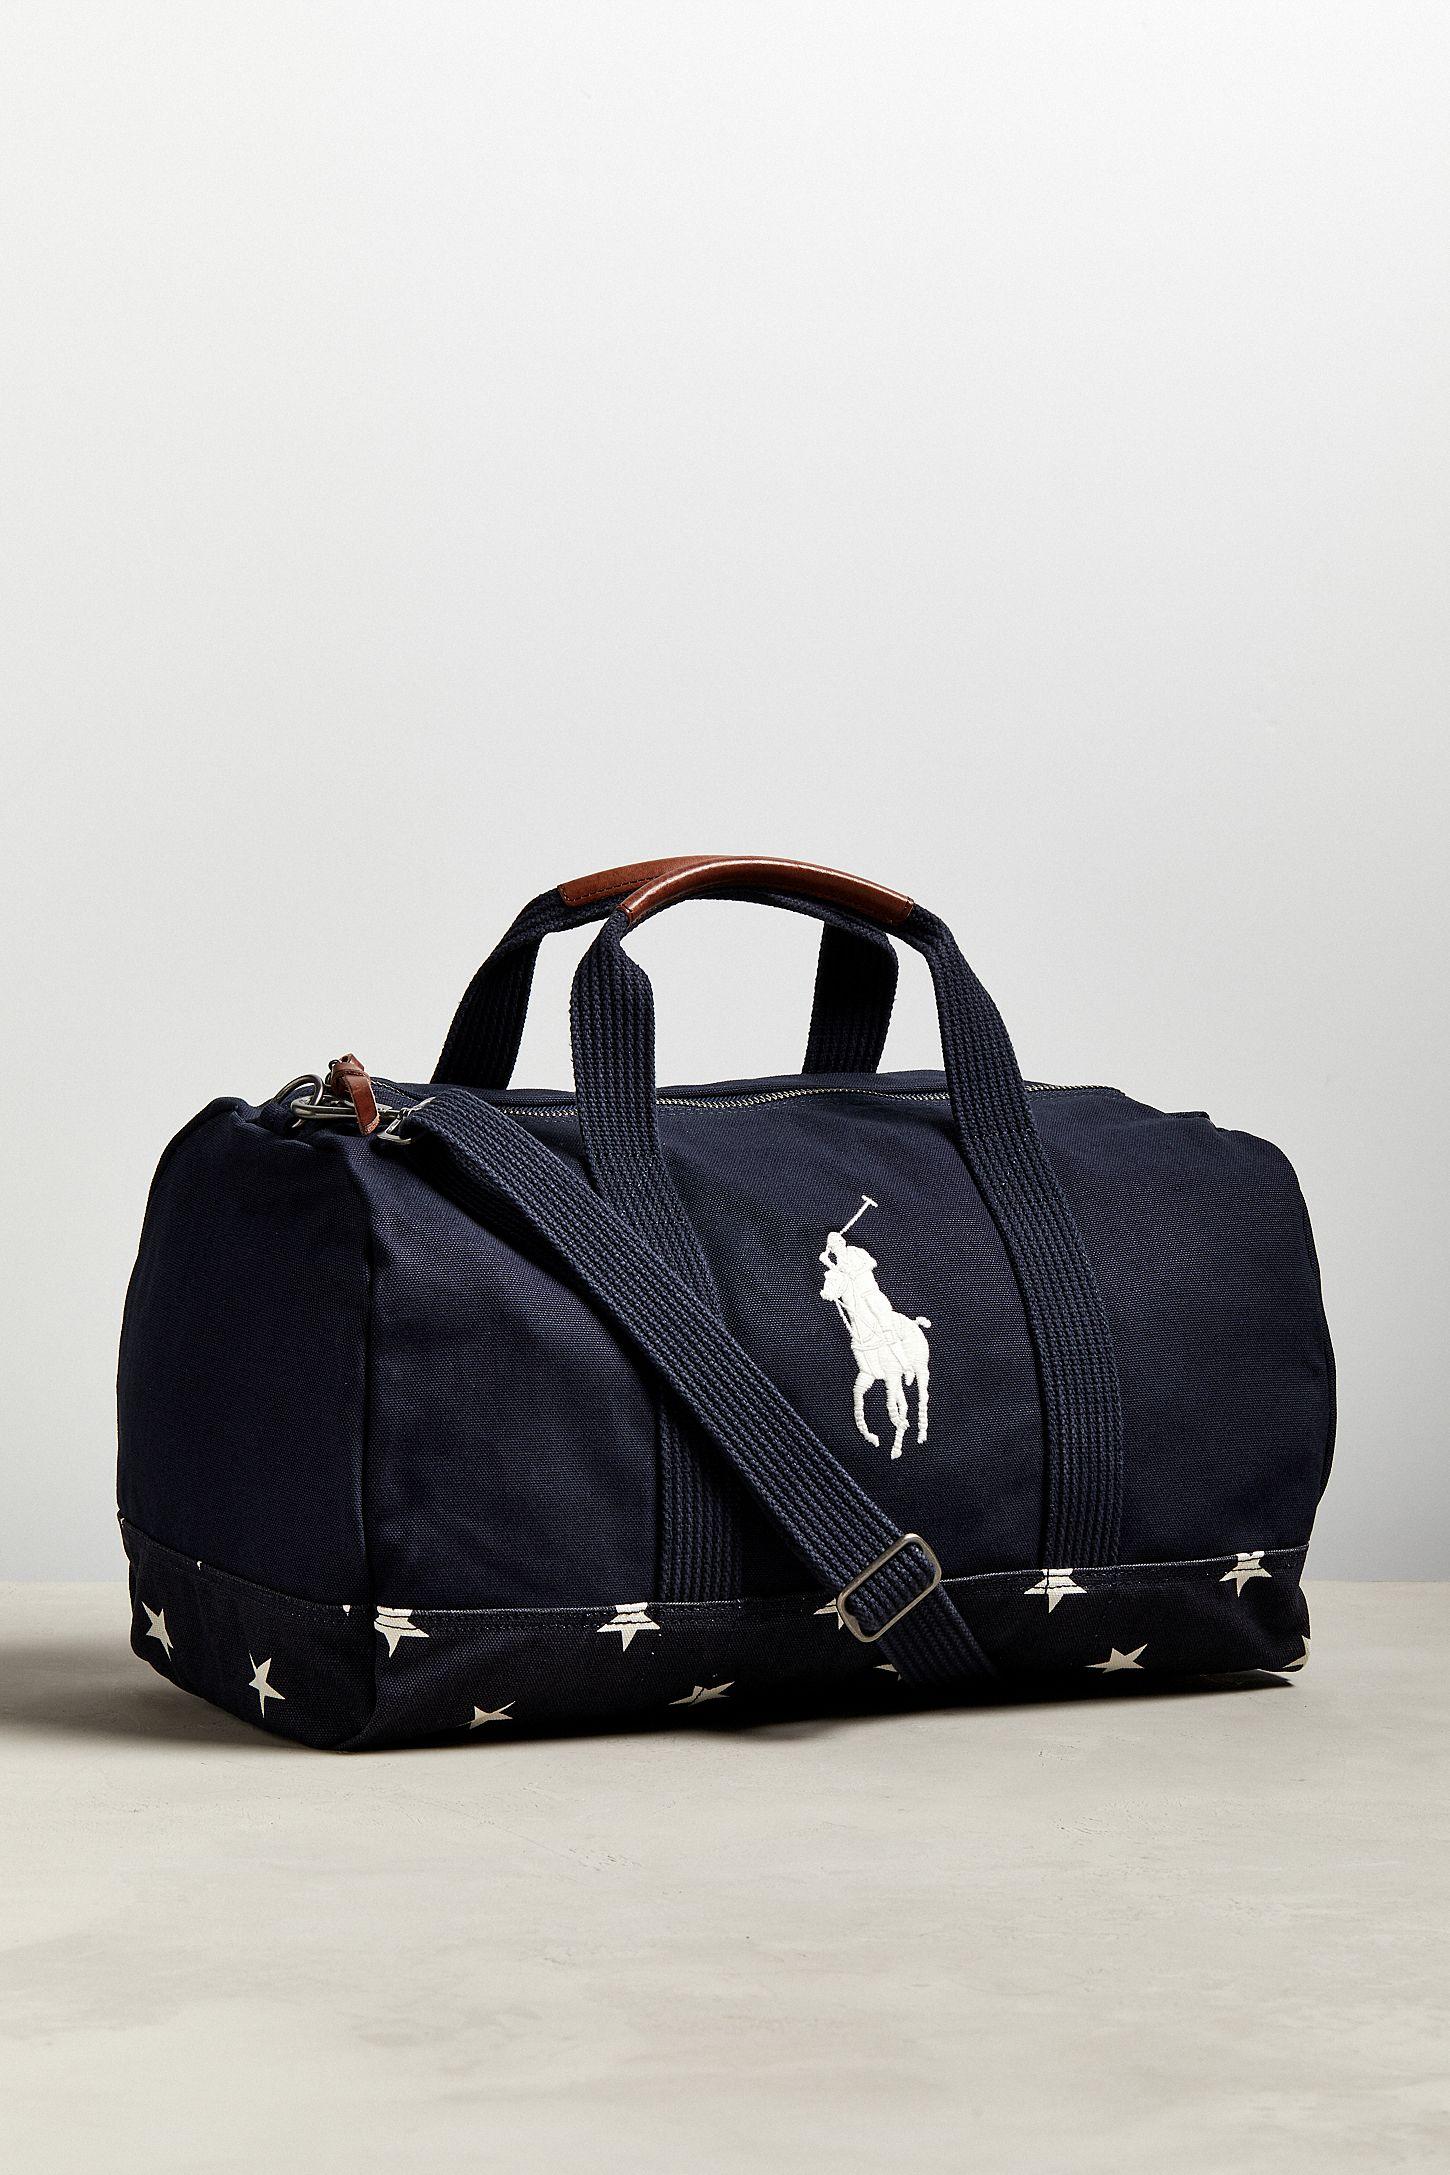 127eff09f237 Polo Ralph Lauren Star Weekend Duffle Bag